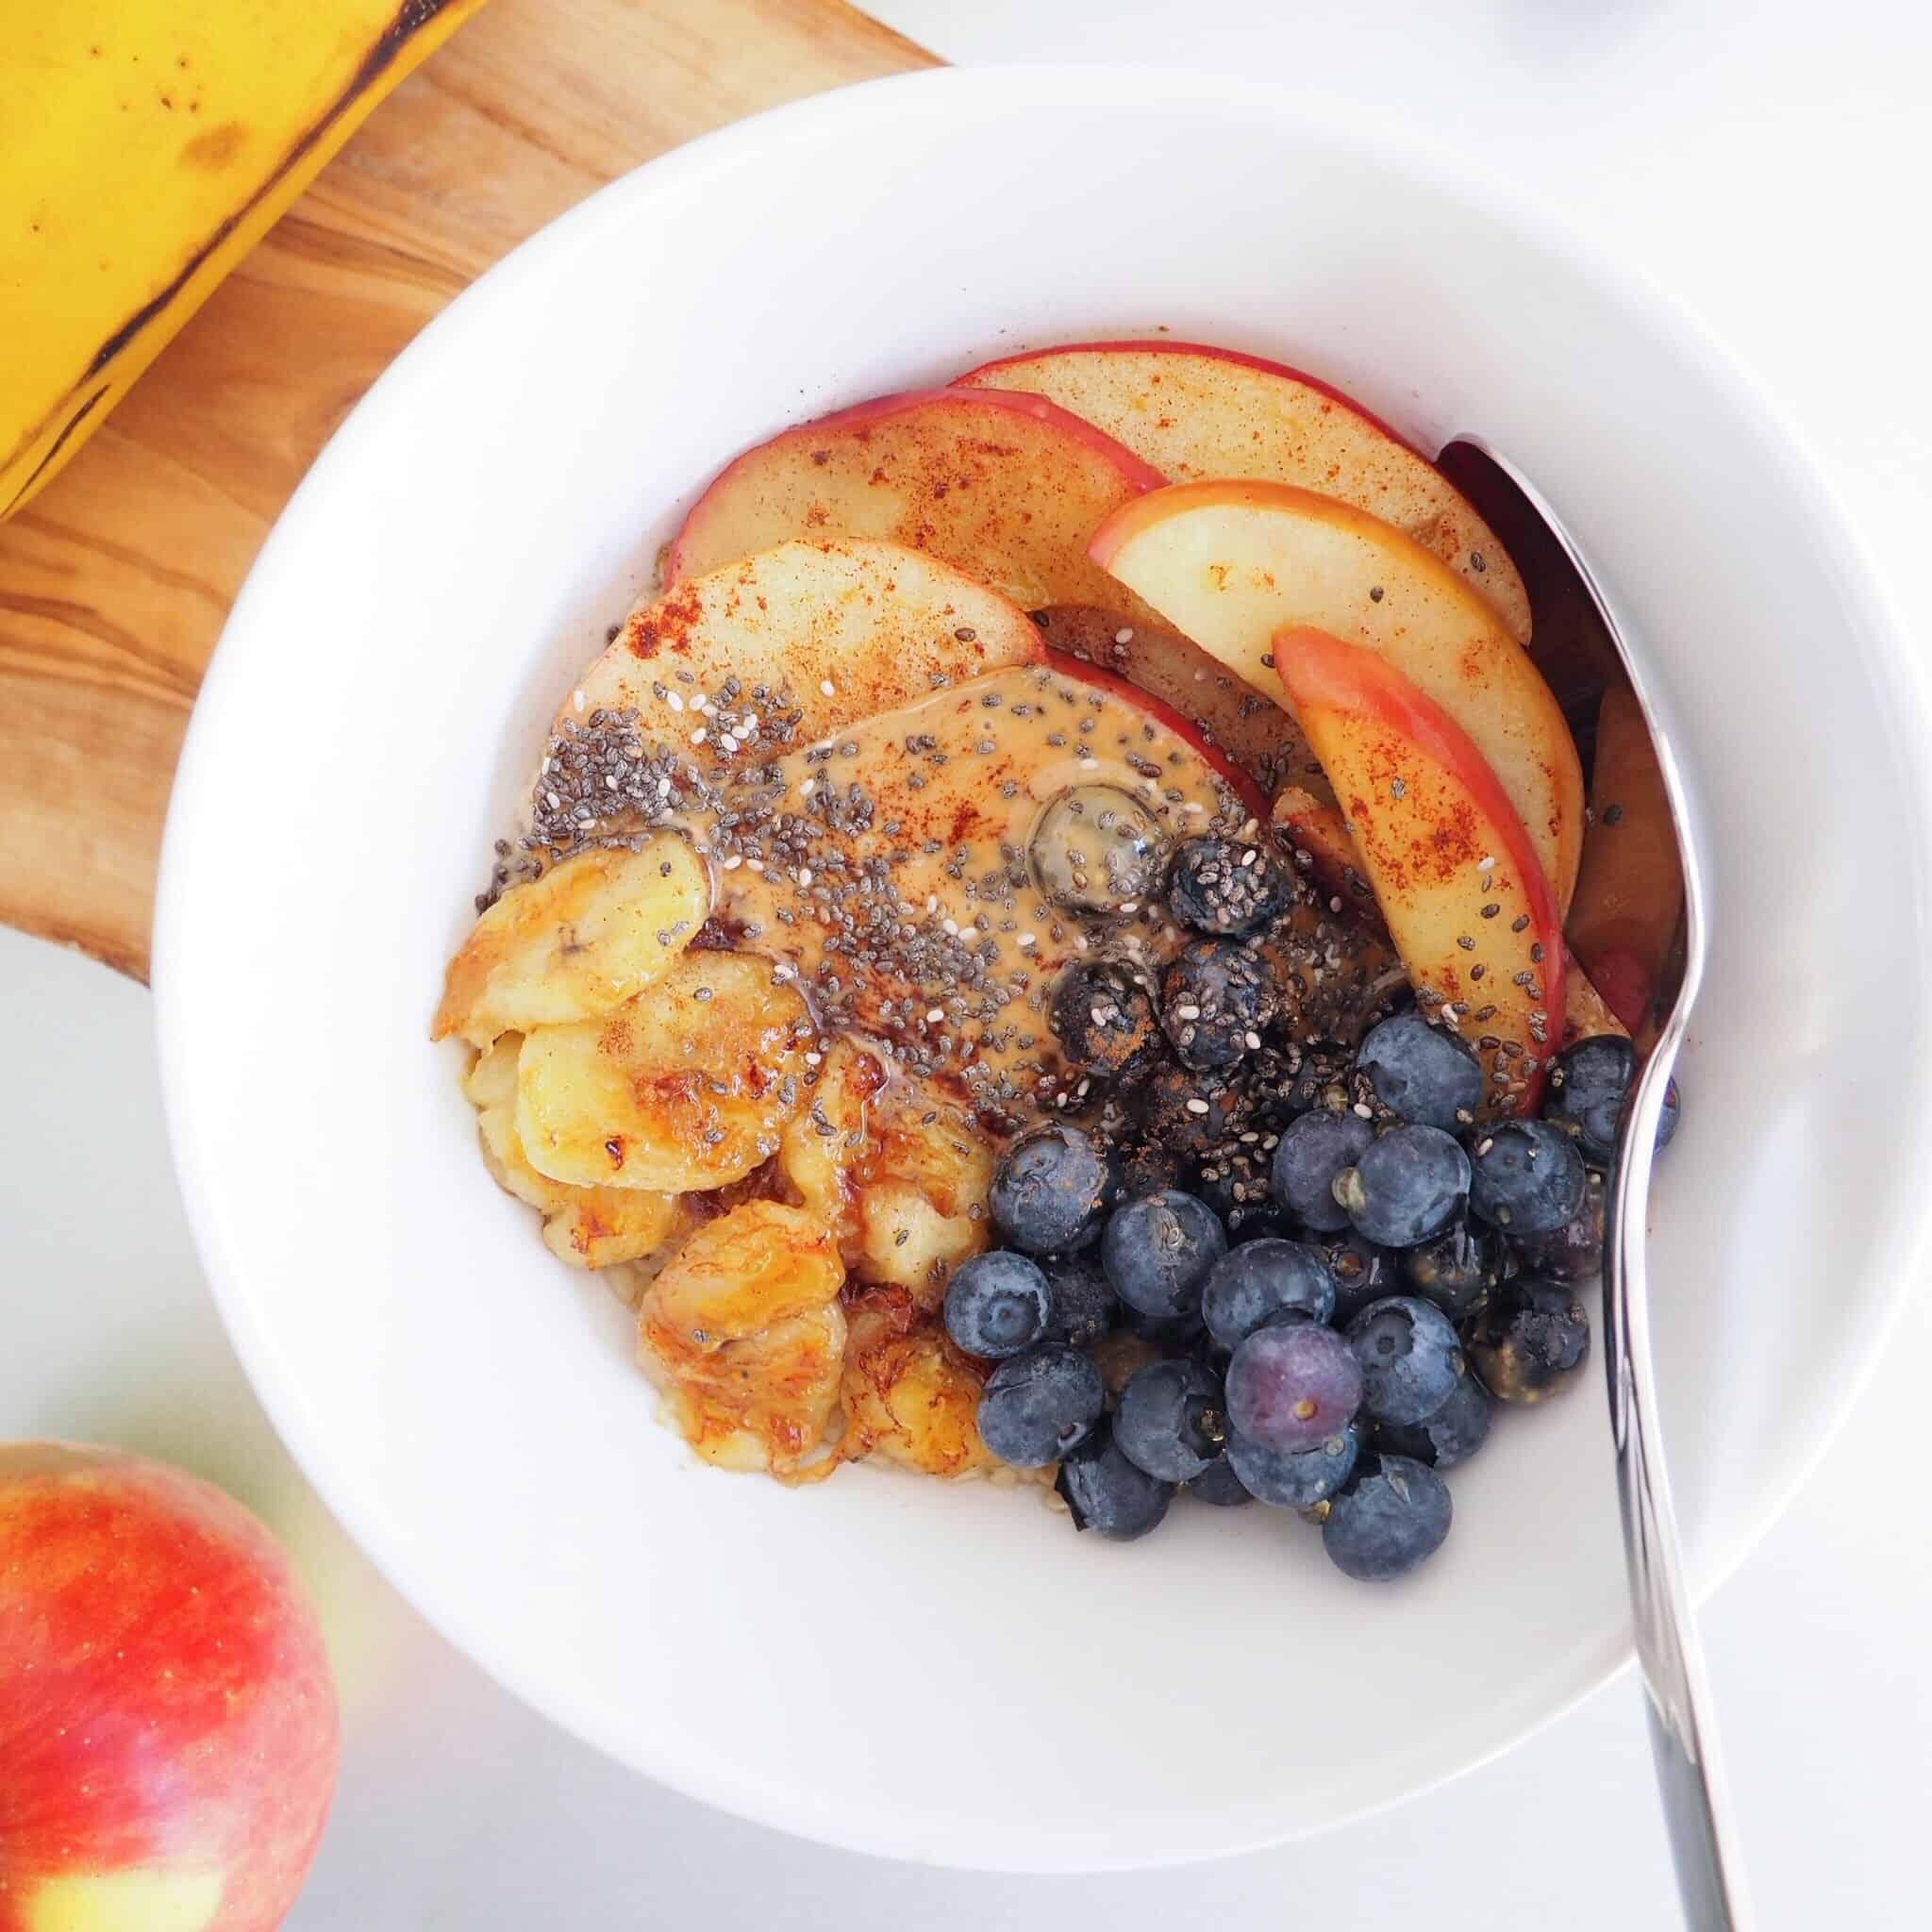 sauteed banana apple oatmeal